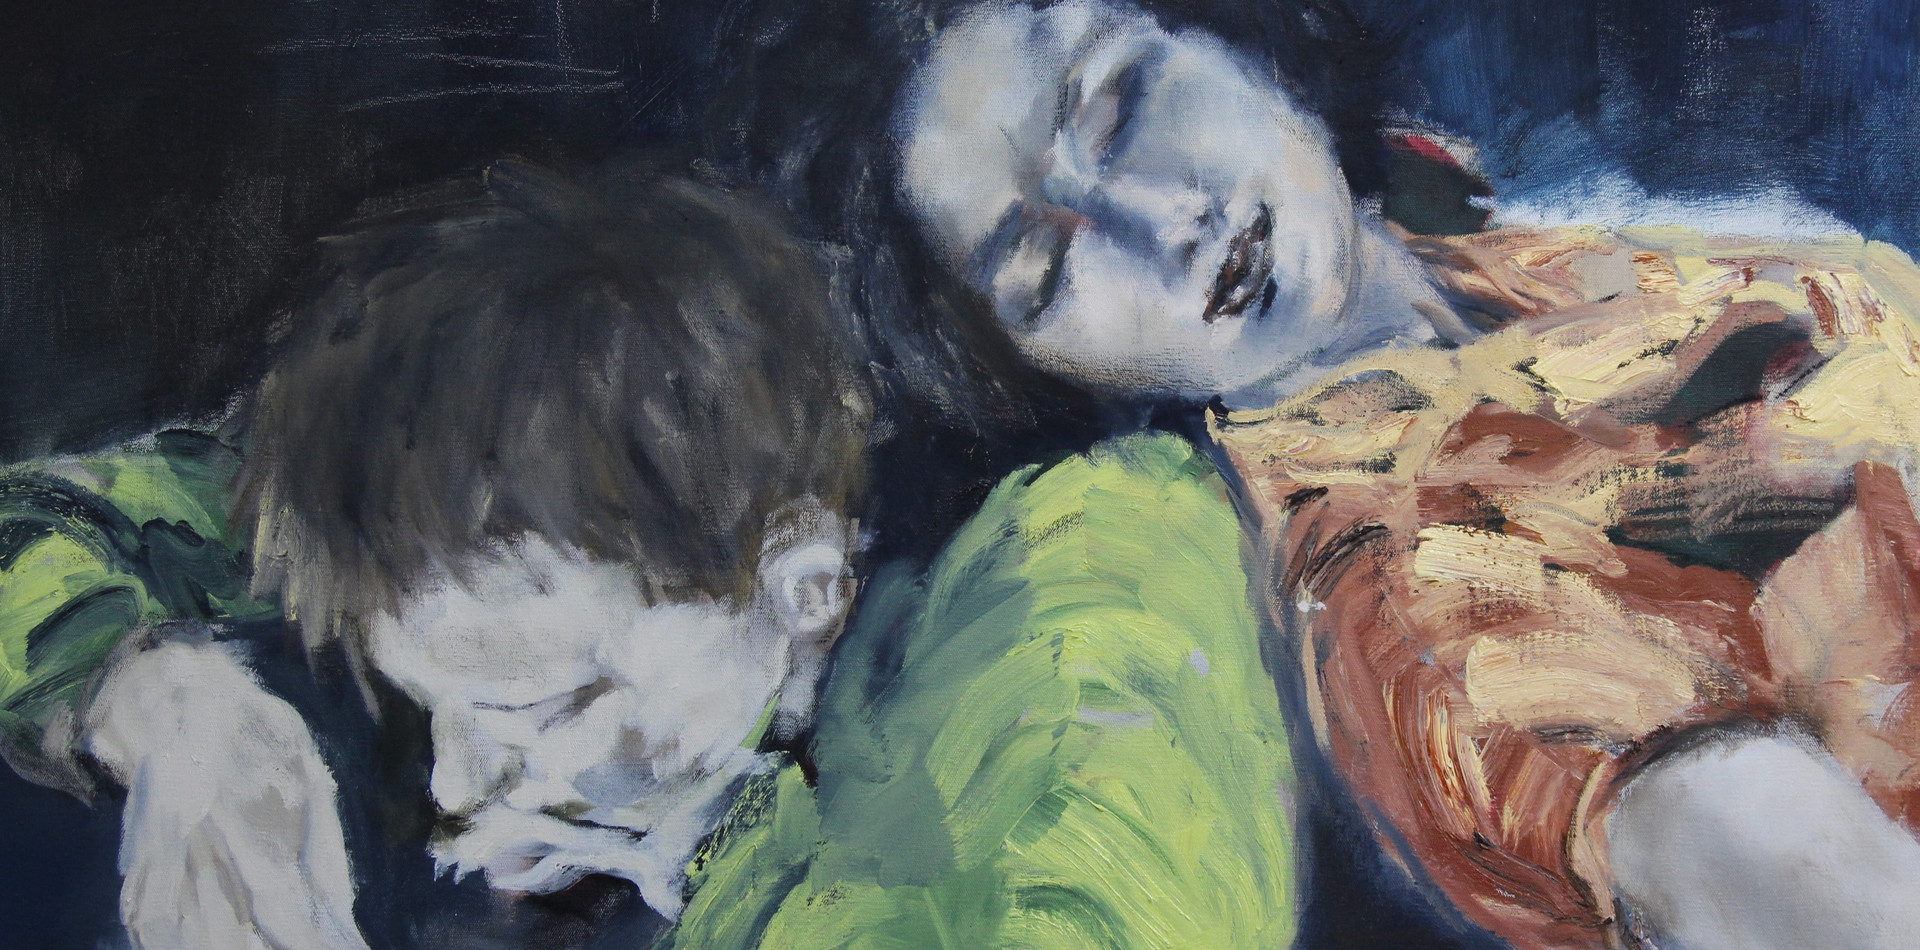 Verano | 2019 Acrílica, óleo e carvão sobre tela / Acrylic, oil and charcoal on canvas 66 x 100 cm